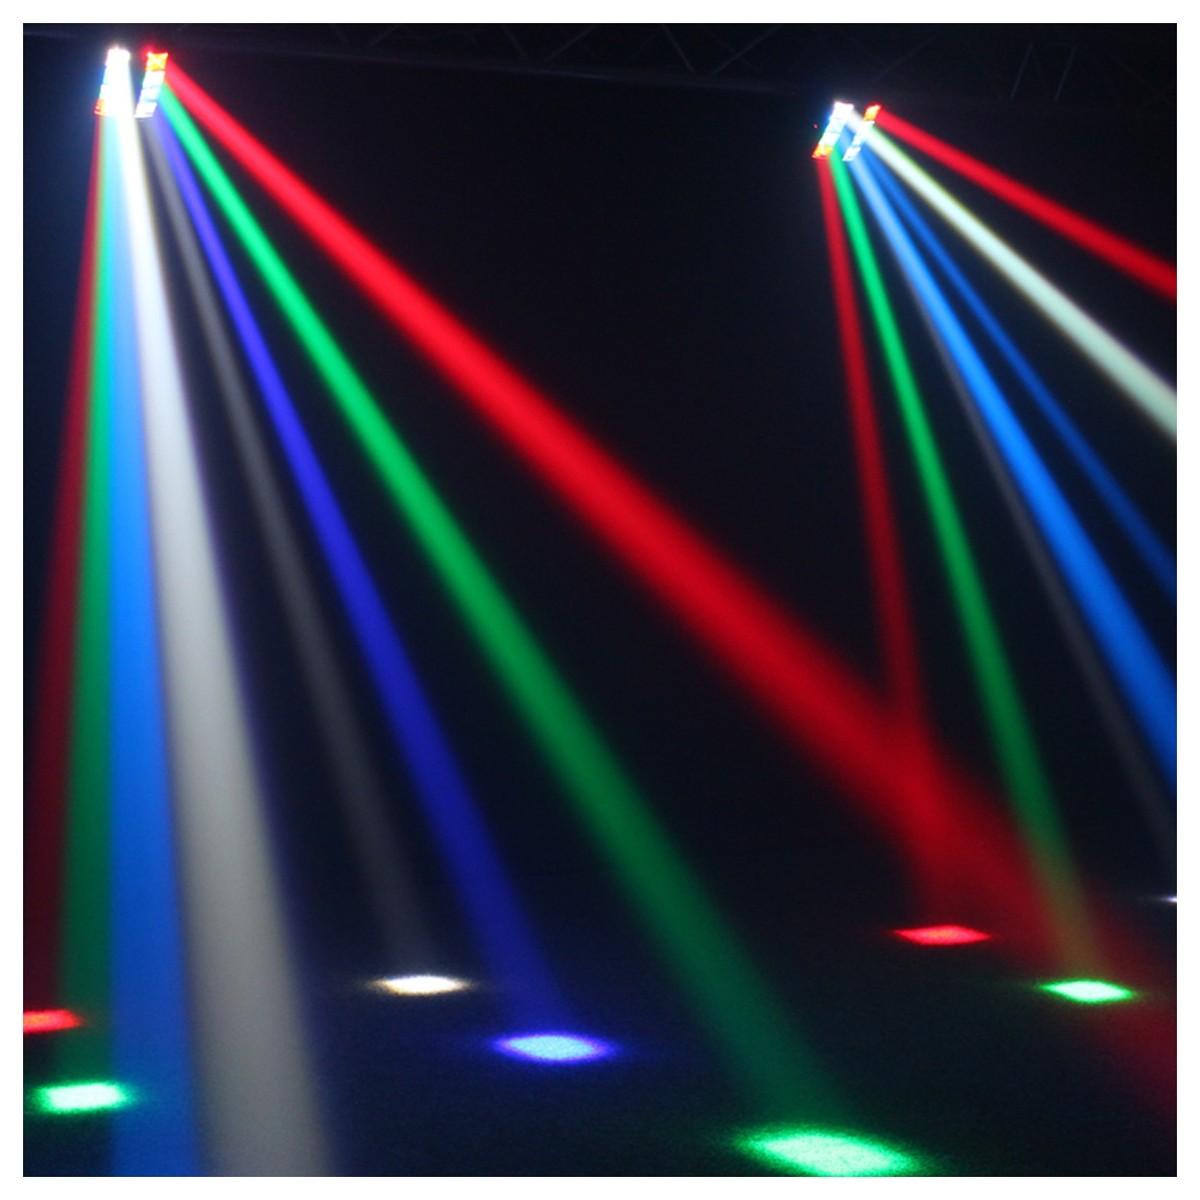 Equinox Onyx LED Bar Light na Gear4Music.com 0c0ef2d8887